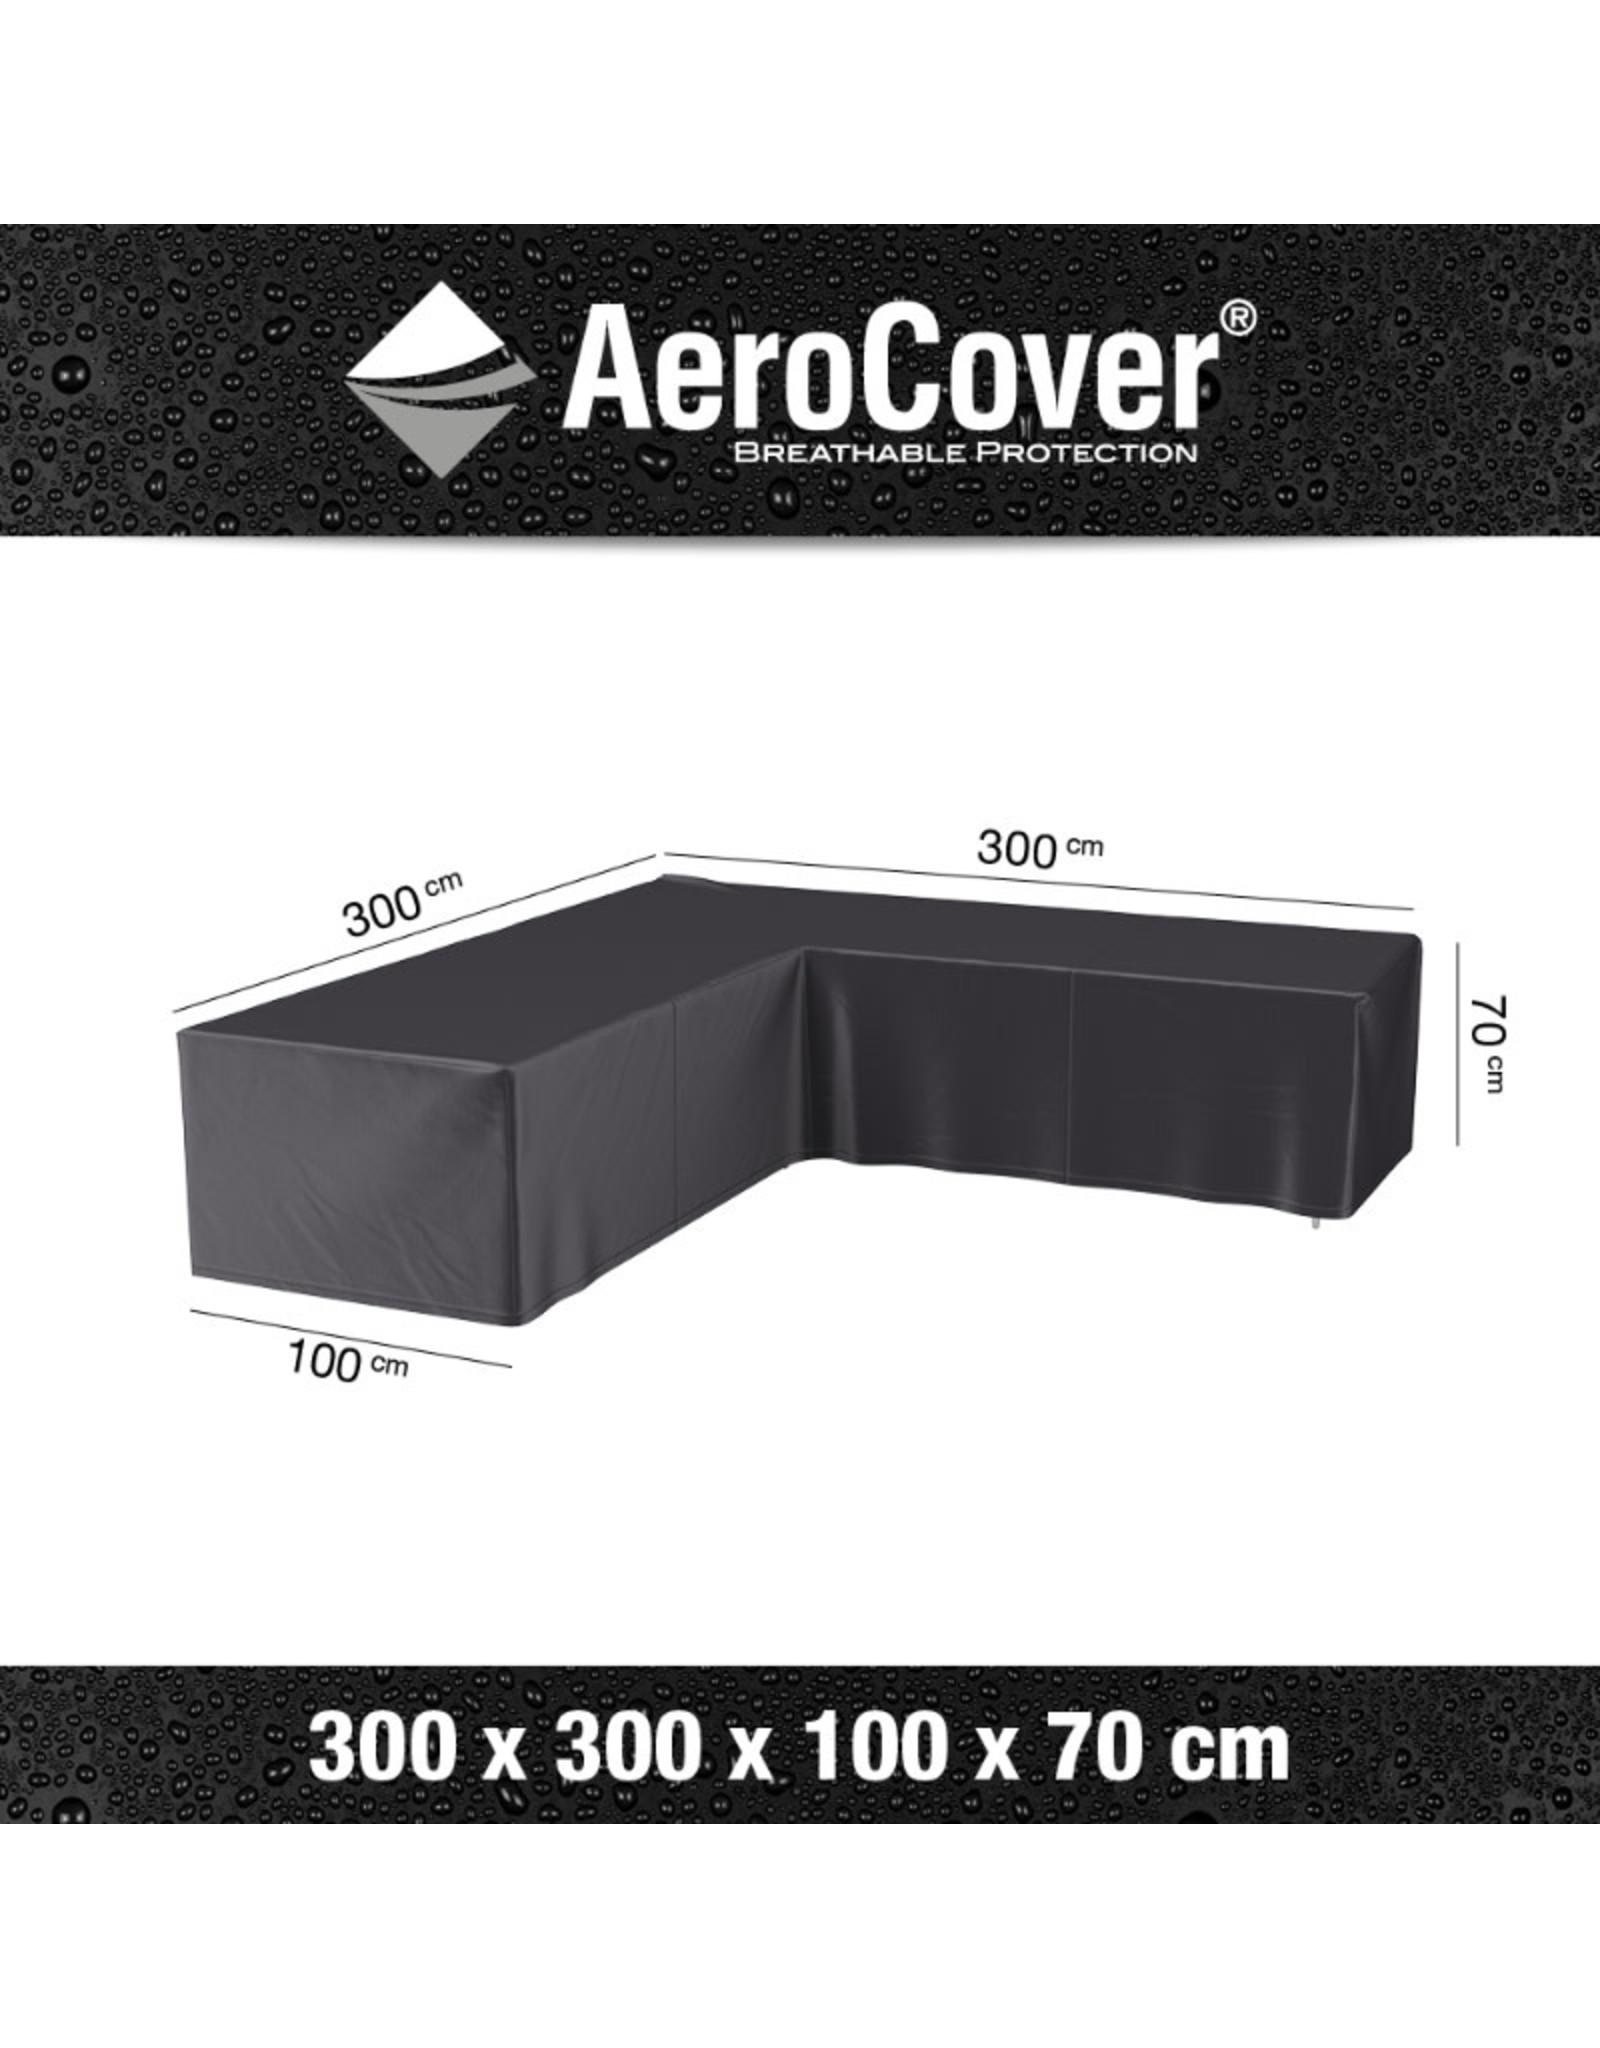 Aerocover AeroCover Lounge set cover corner set300x300x100xH70